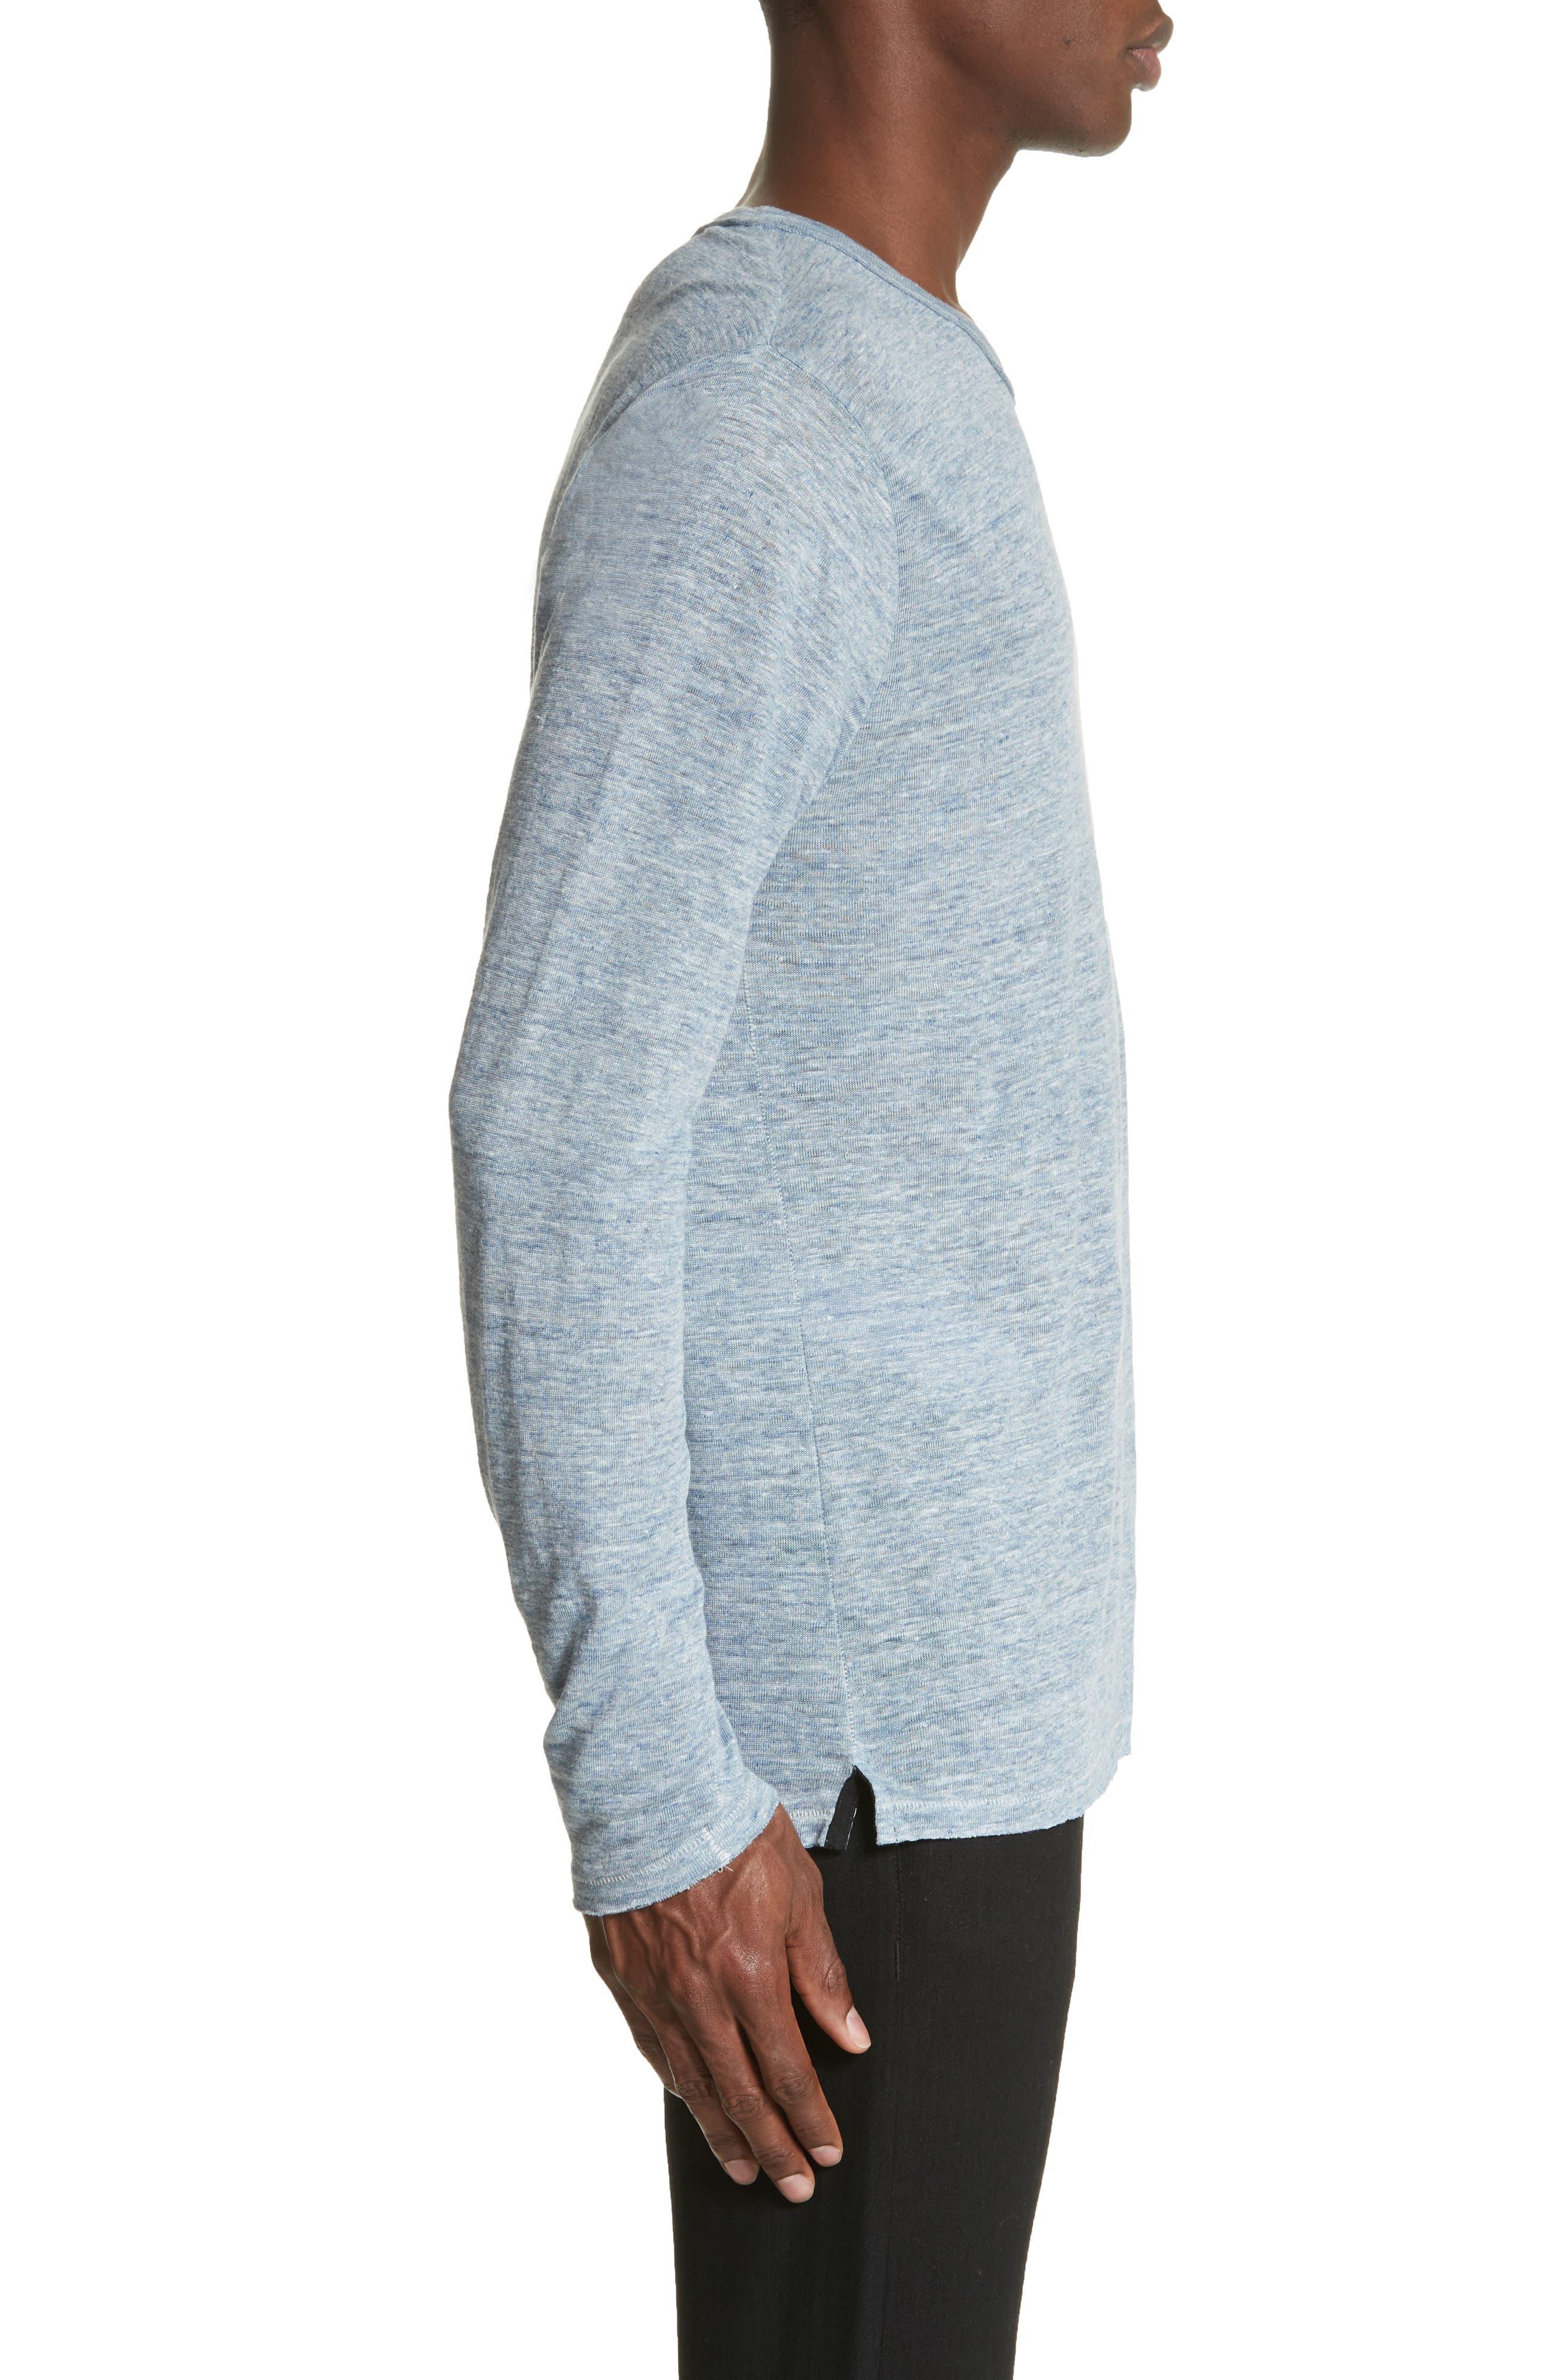 Owen Linen Long Sleeve T-Shirt,                             Alternate thumbnail 3, color,                             Blue